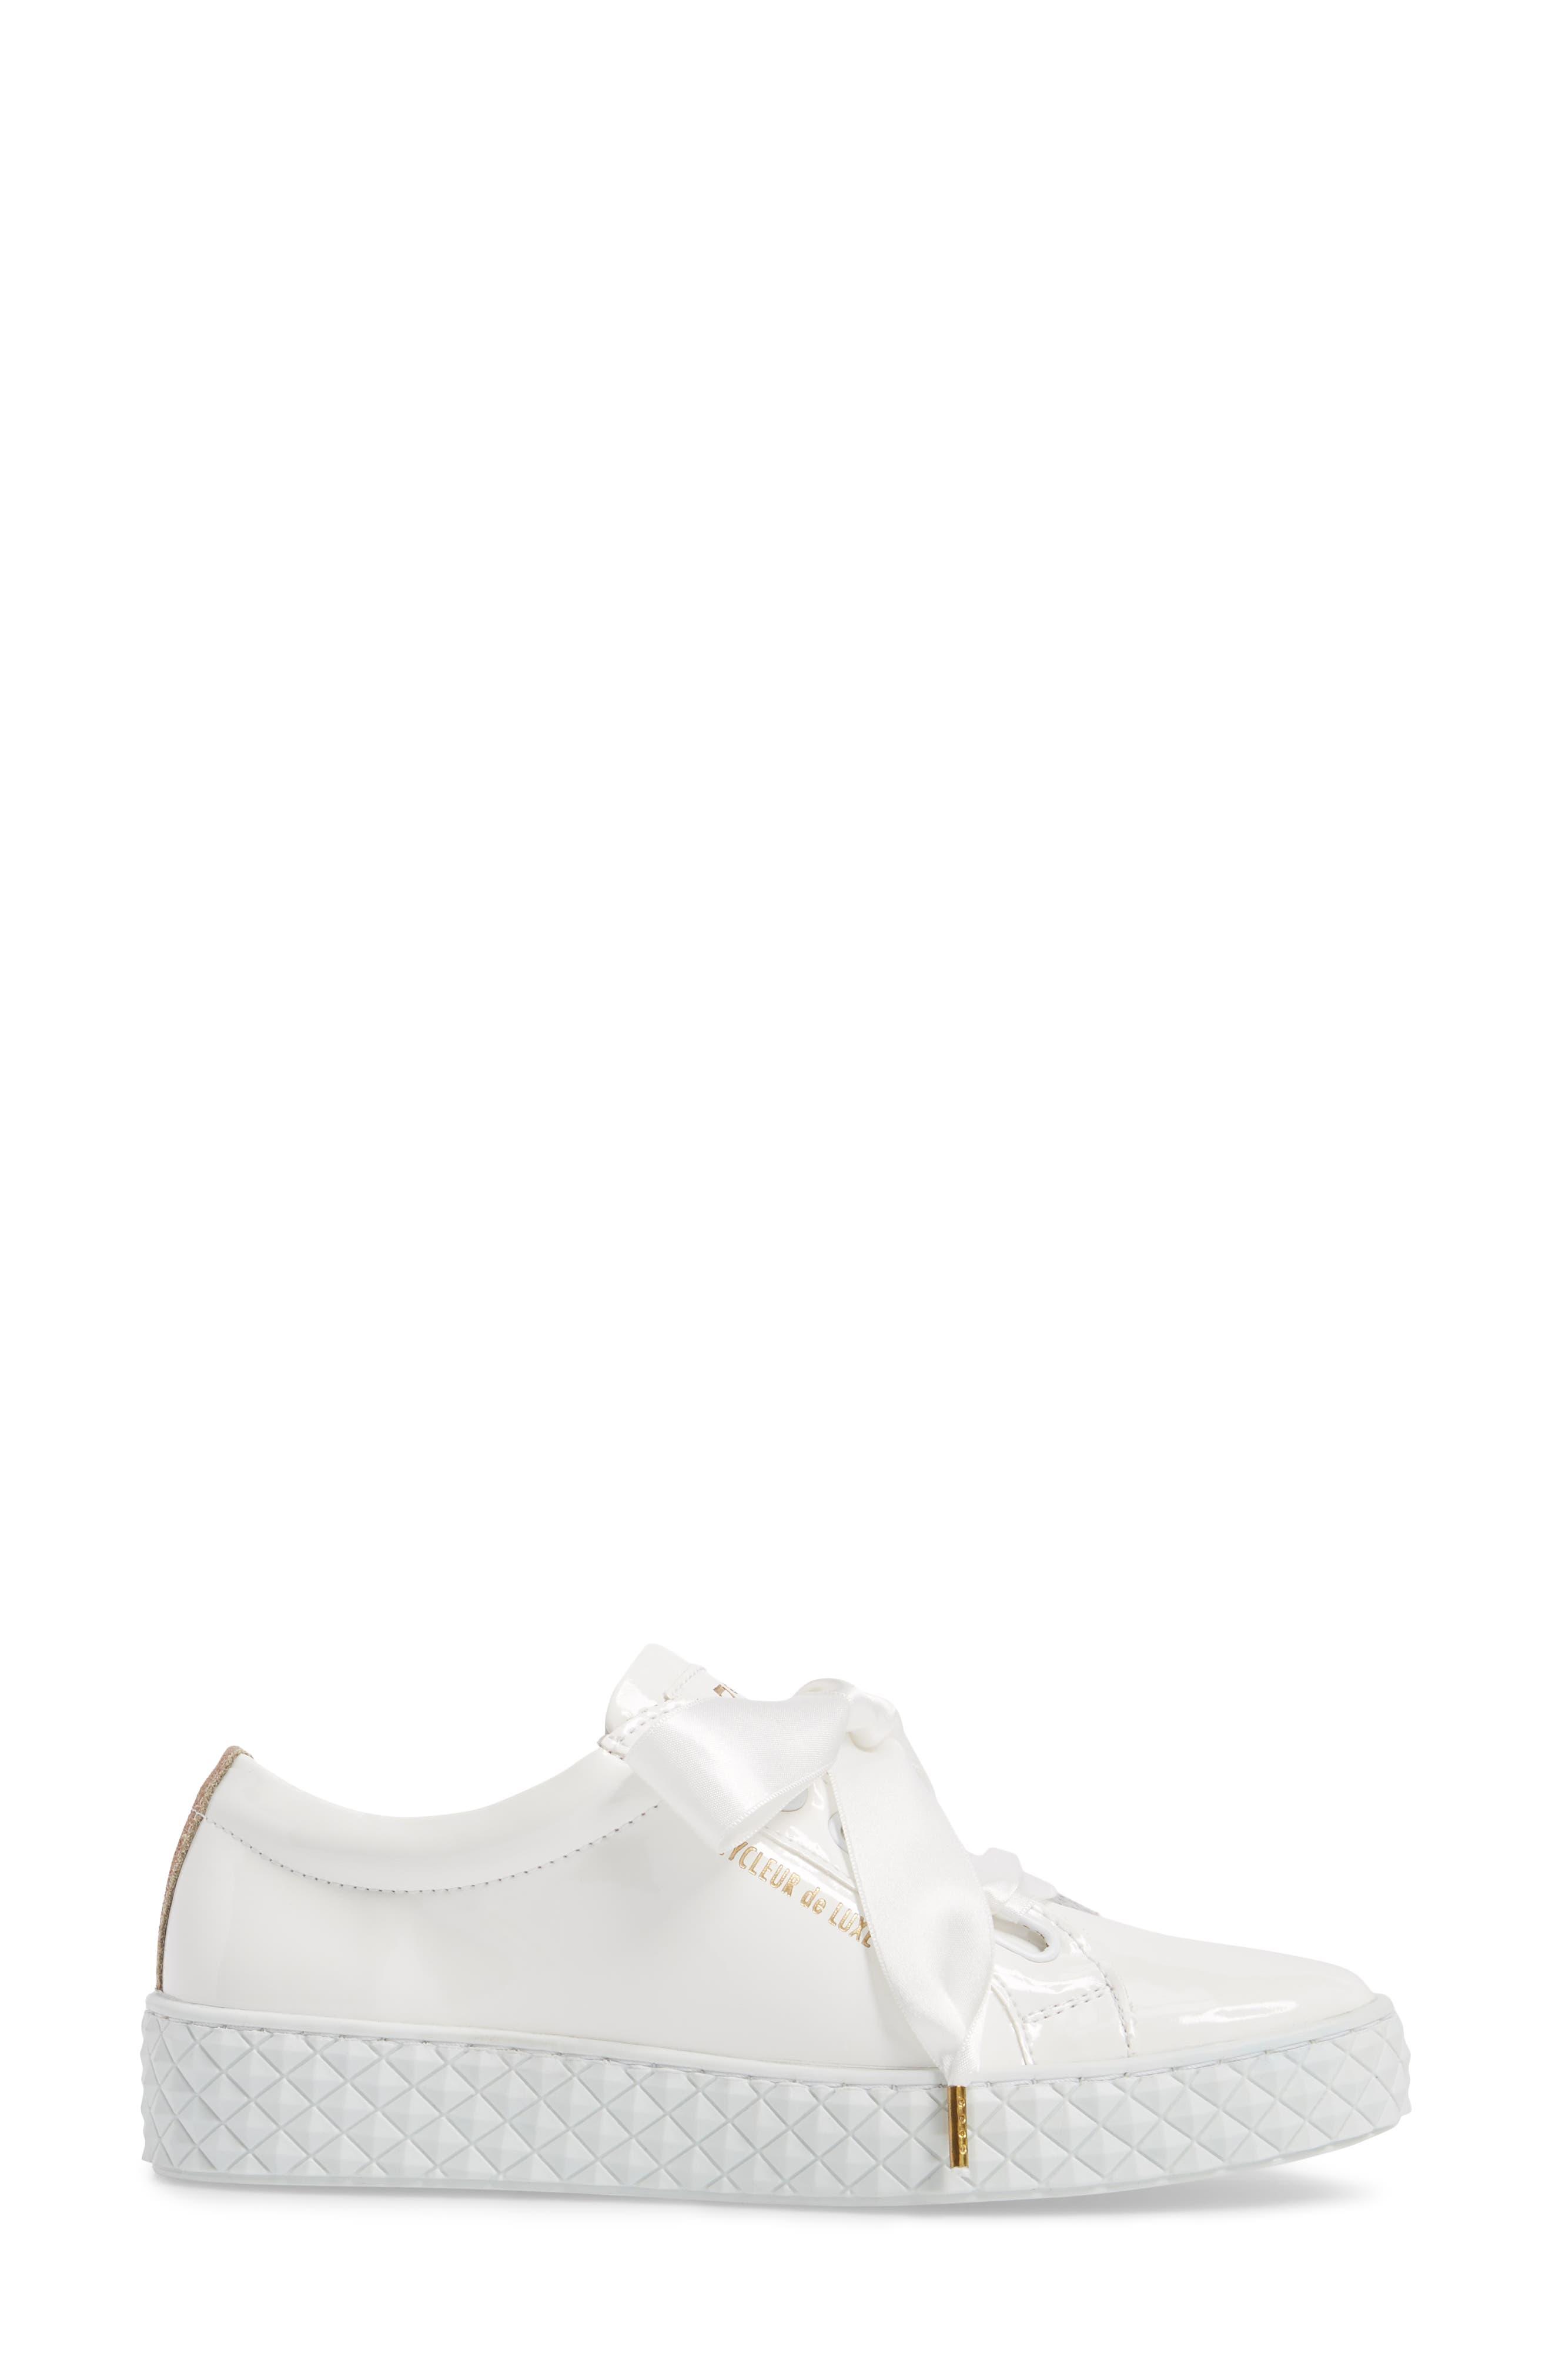 Acton Sneaker,                             Alternate thumbnail 3, color,                             White Patent